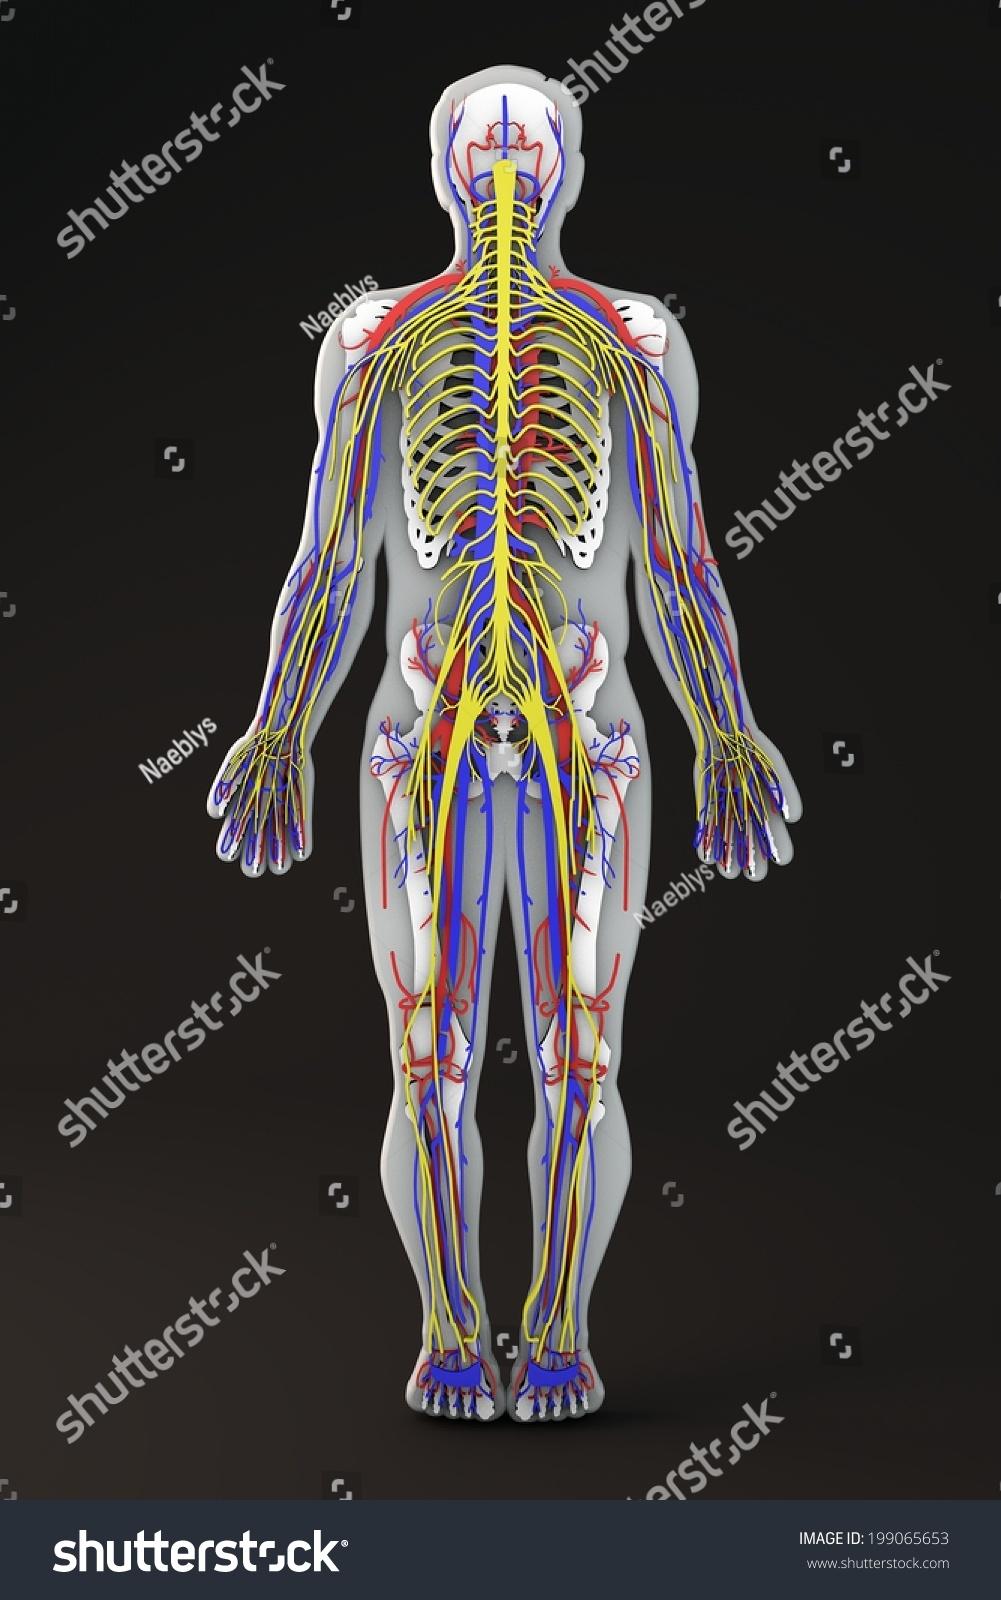 Anastomosis And Its Types